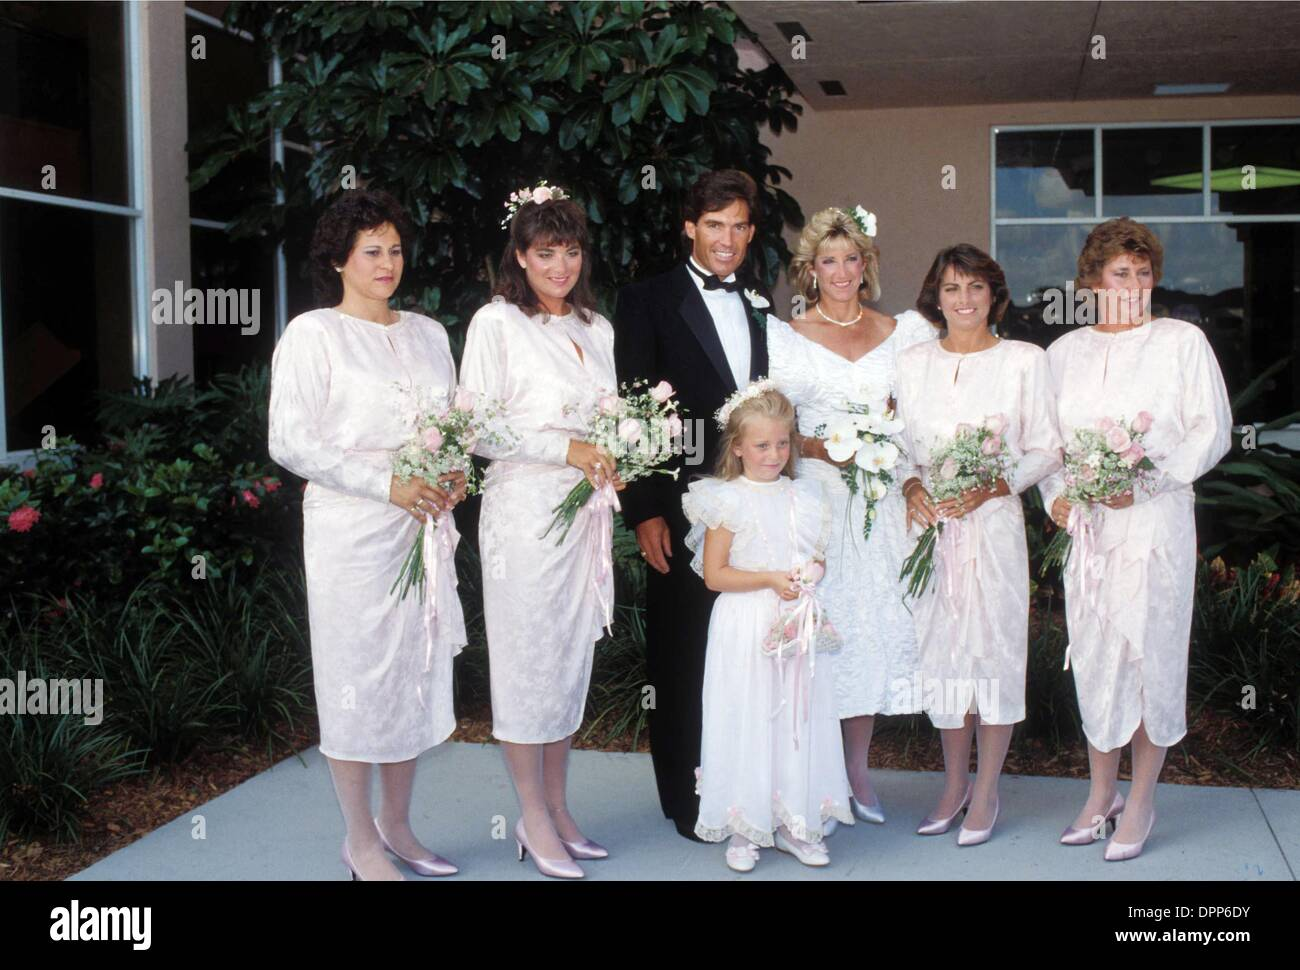 Oct 25 2006 I15099 Chris Evert Wedding To Andy Mill 07 30 1988 Stock Photo Alamy